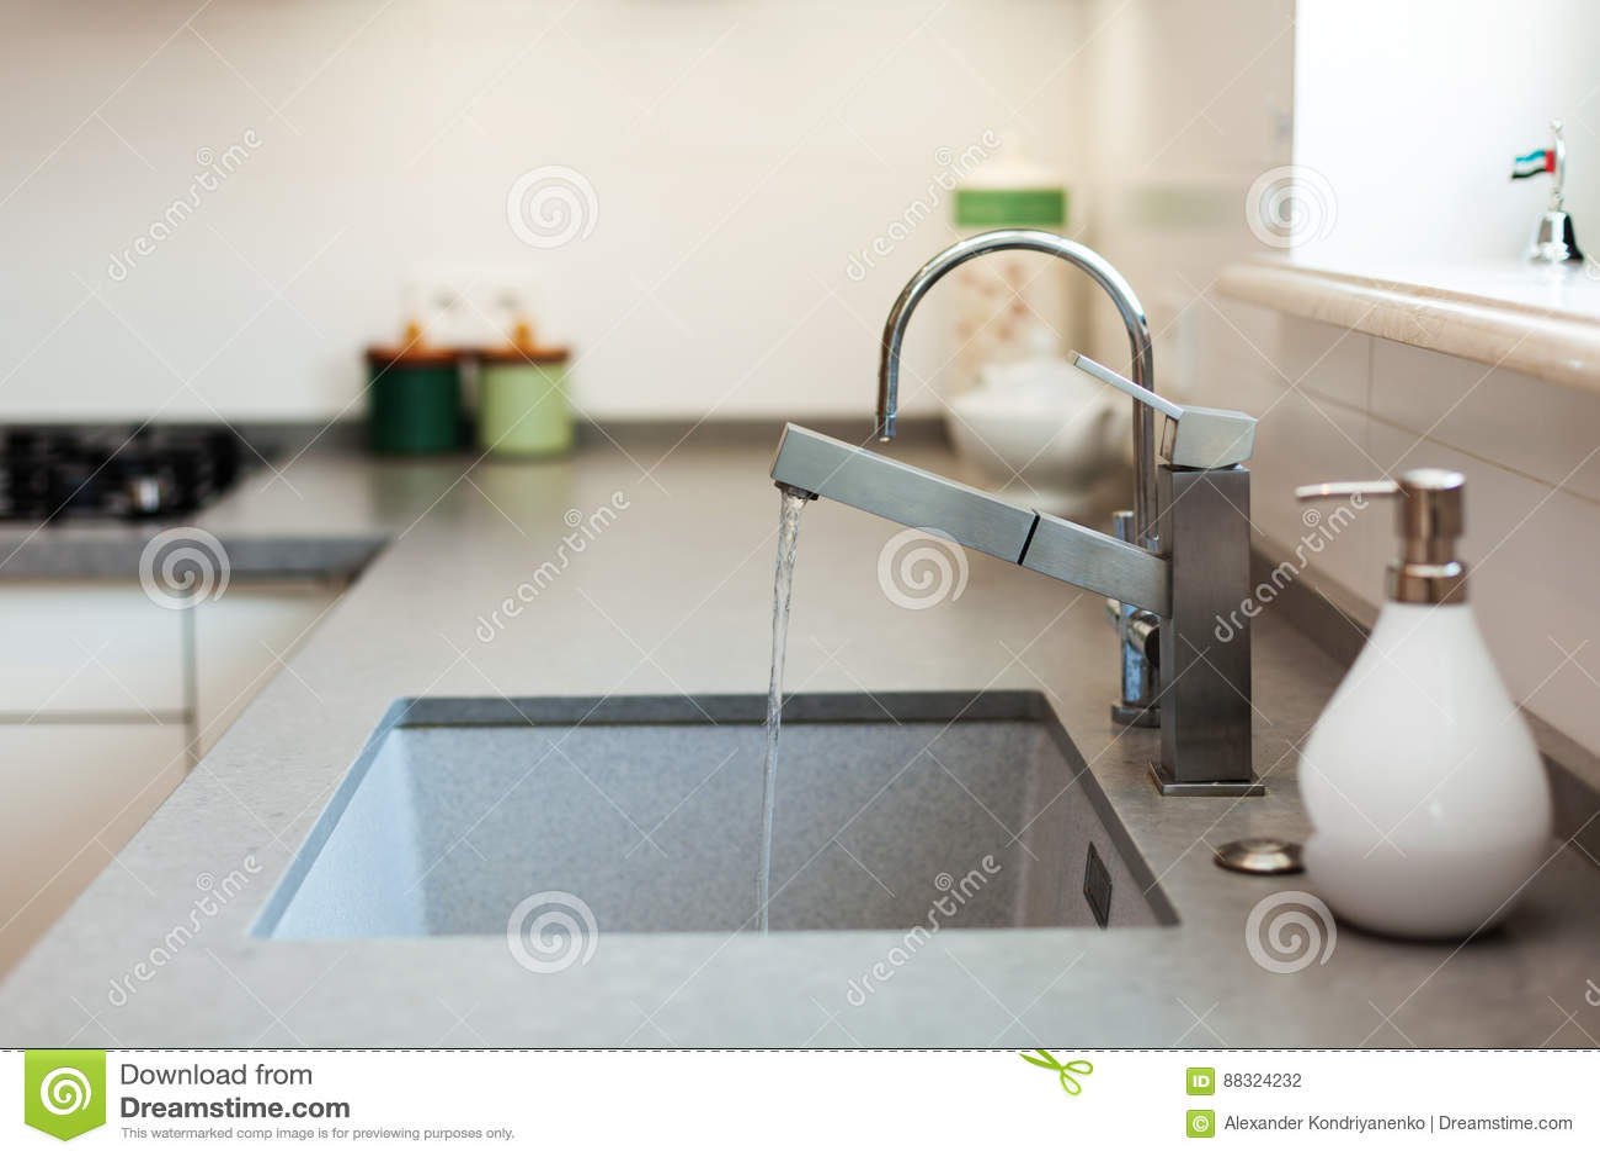 Golpecito De Agua Moderno Del Cromo Del Diseñador Sobre Fregadero De ...